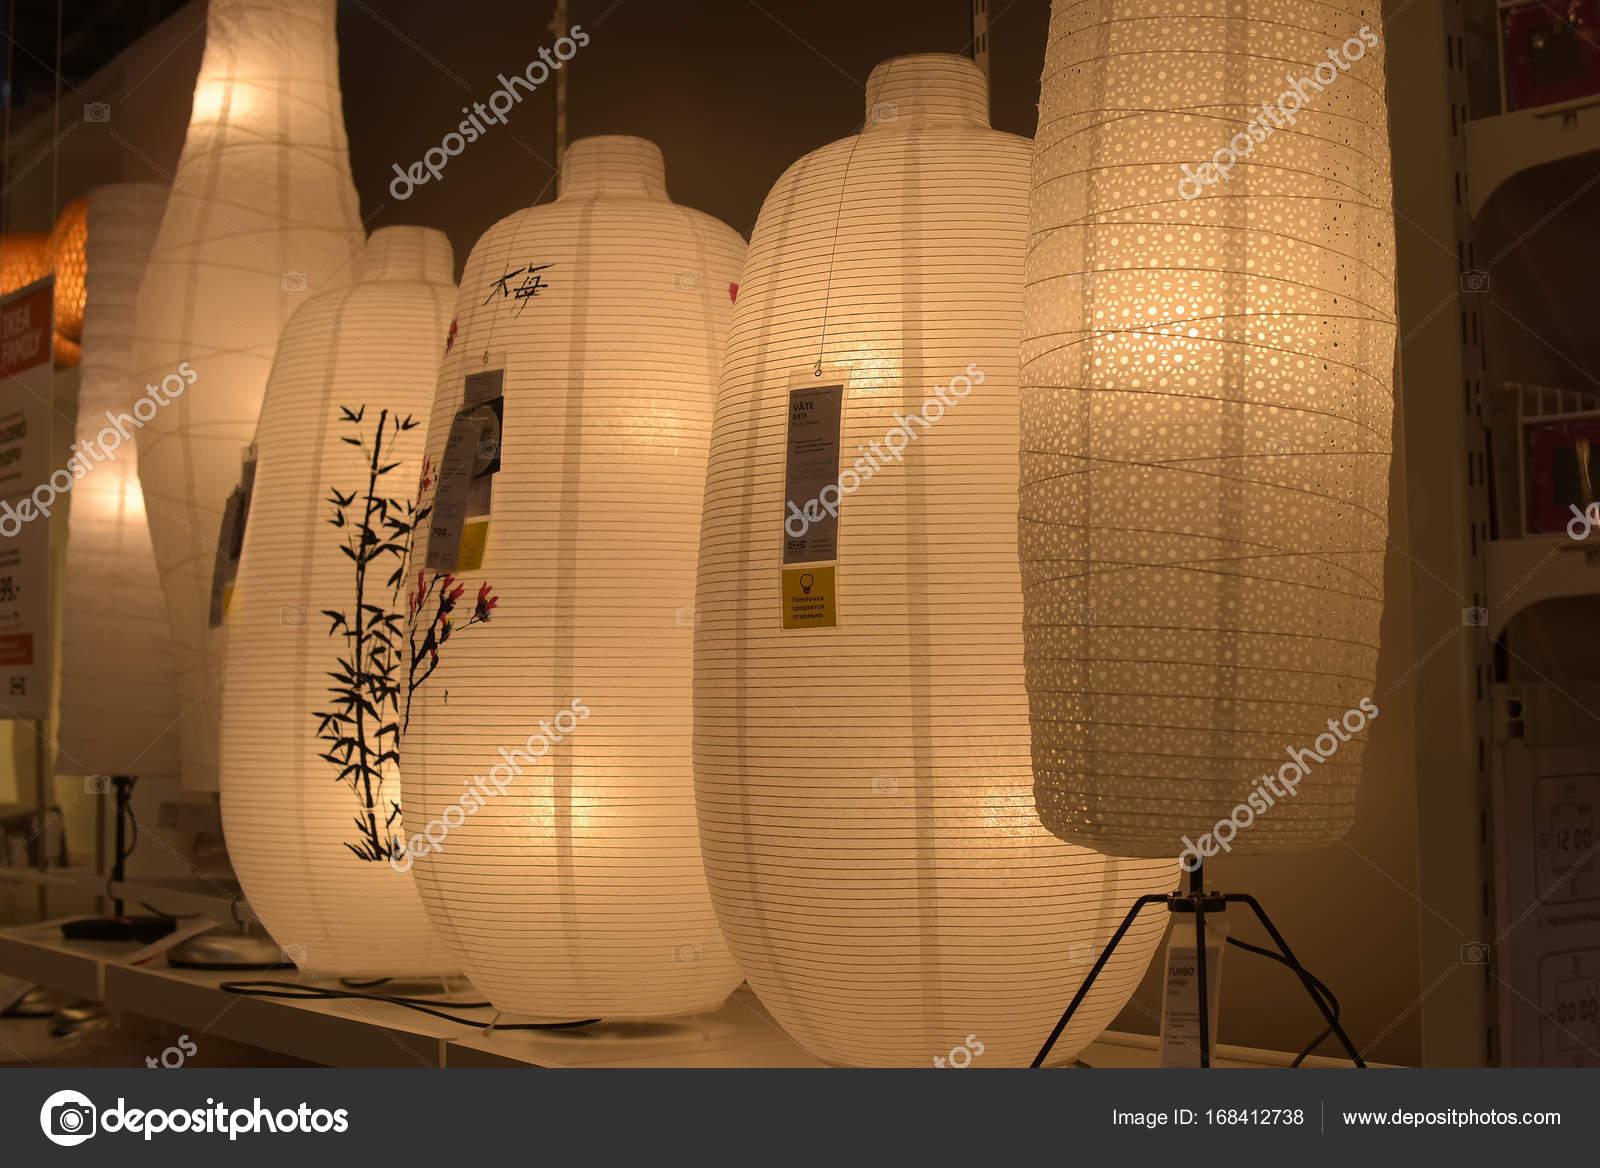 Russia san pietroburgo 15 03 2015 vari apparecchi di illuminazione